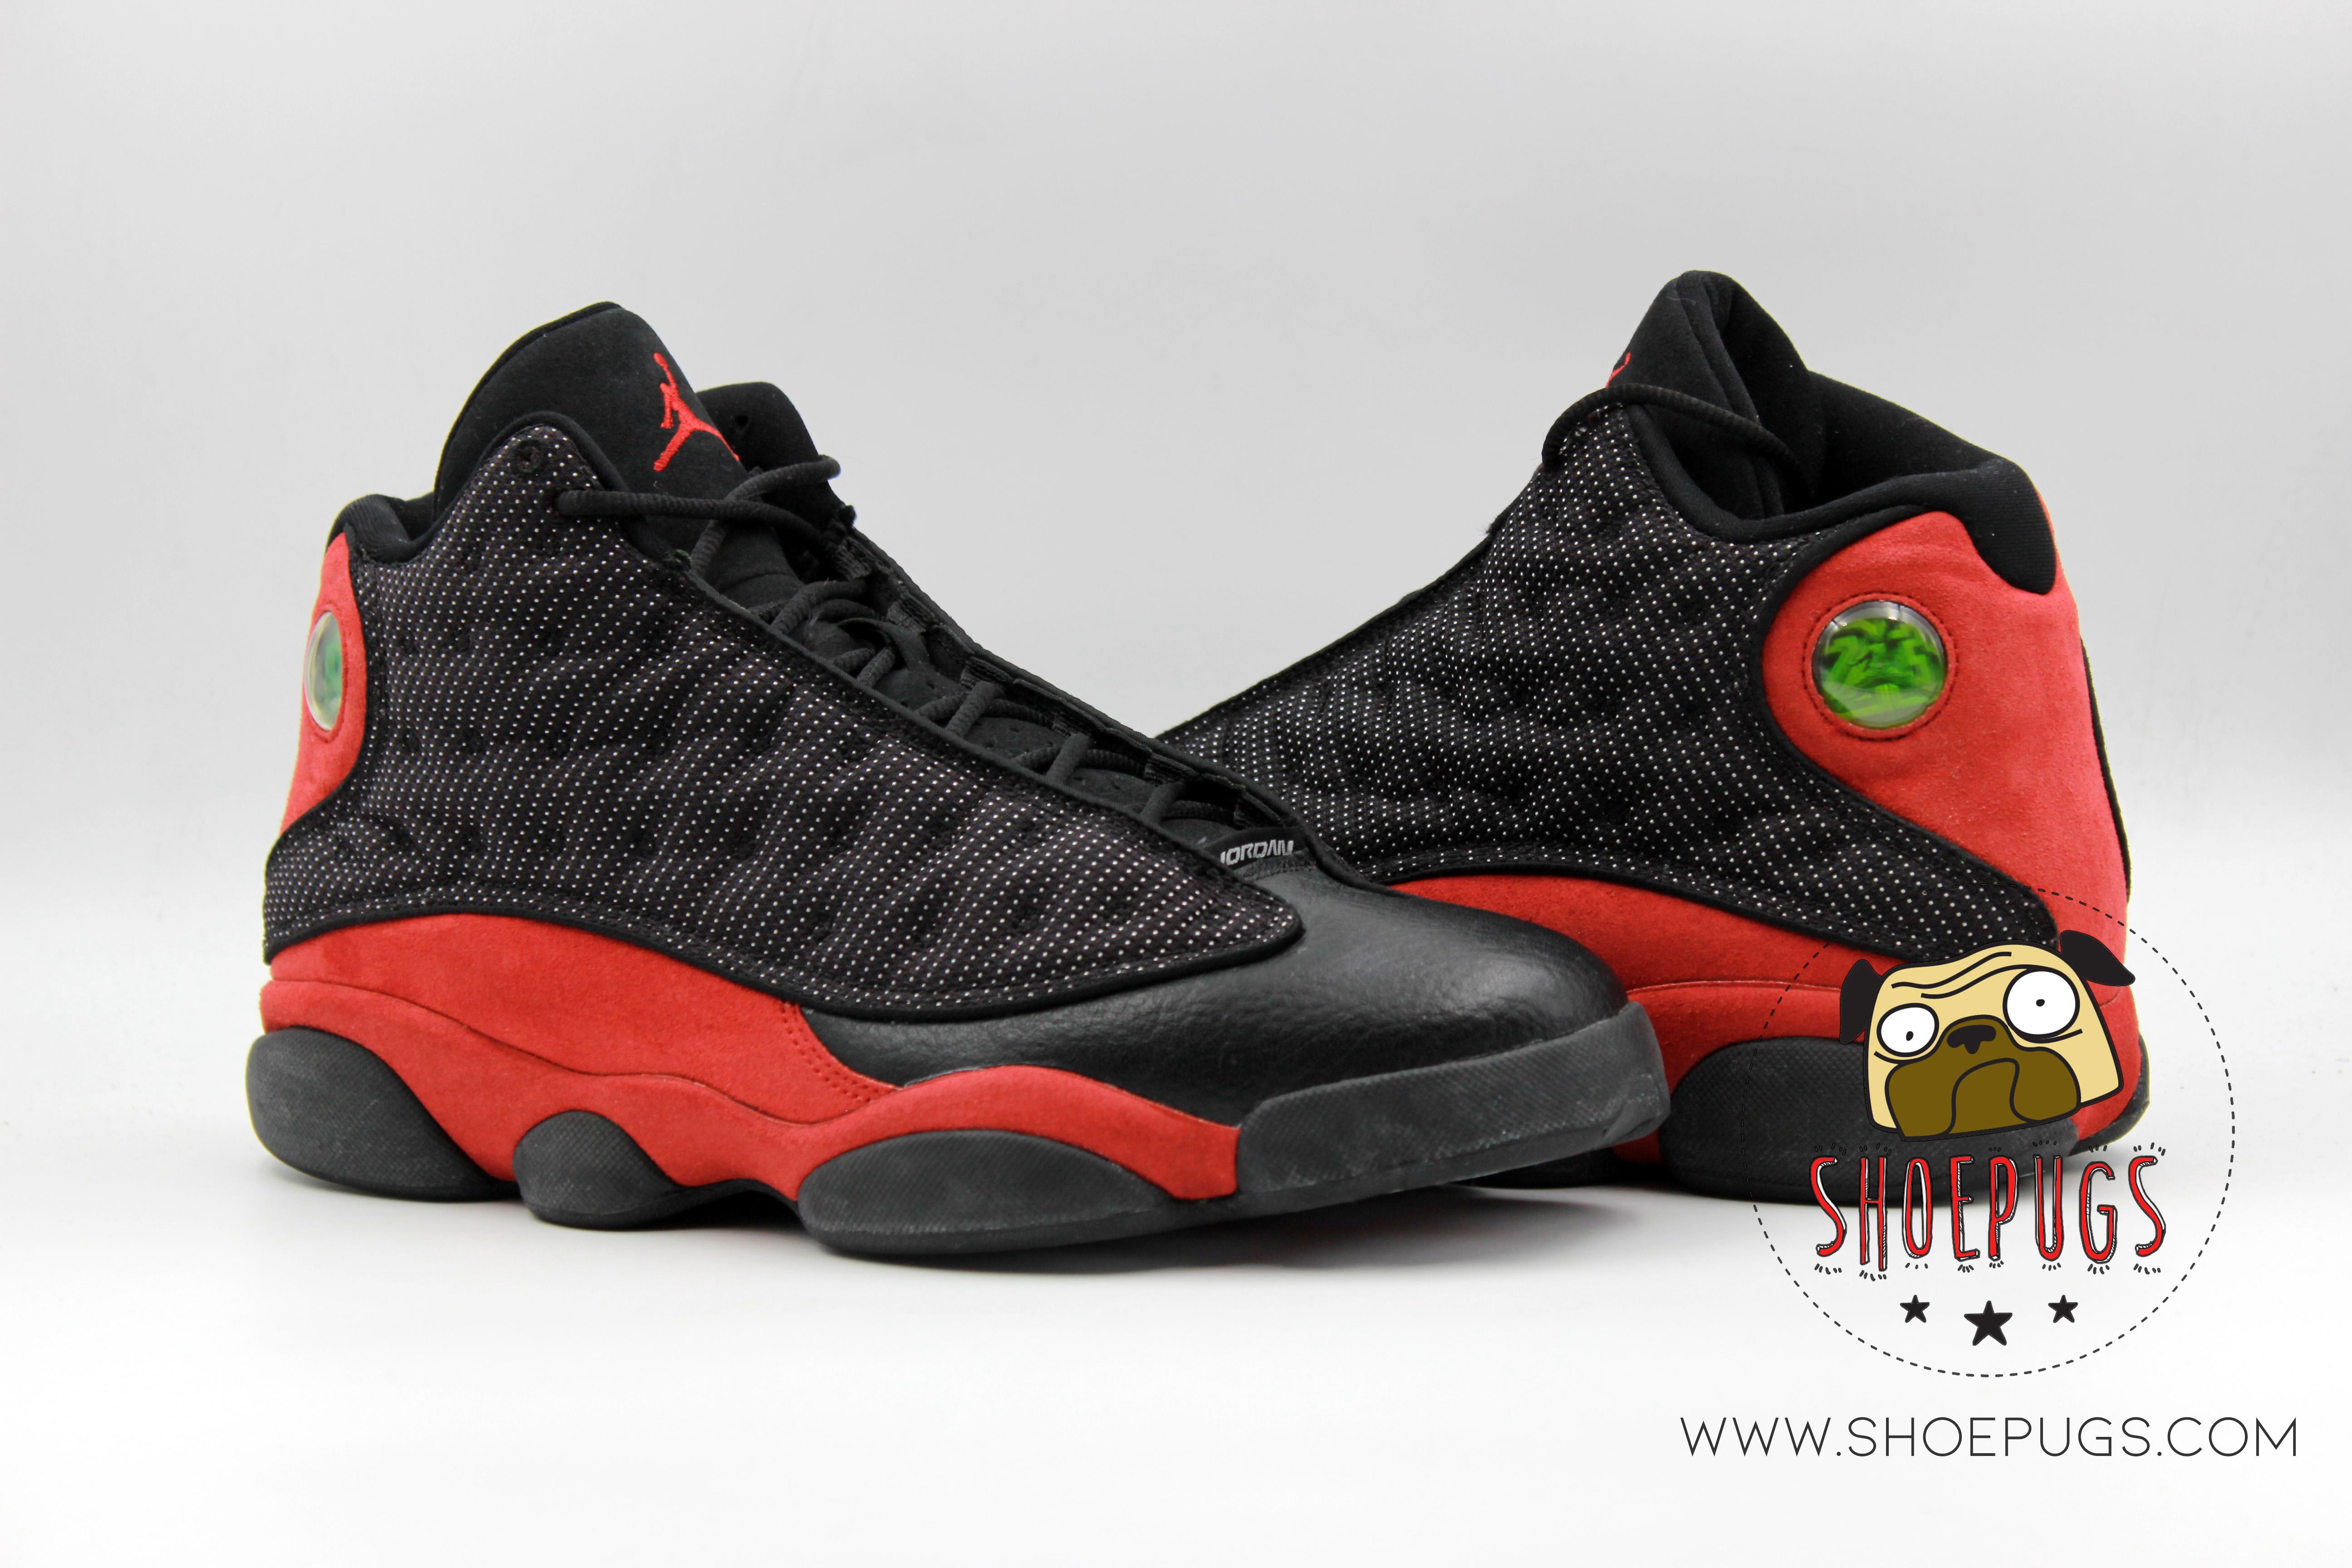 cheaper 5a658 0e157 Jordan Brand ×. 2013 Air Jordan Retro XIII 13 BRED